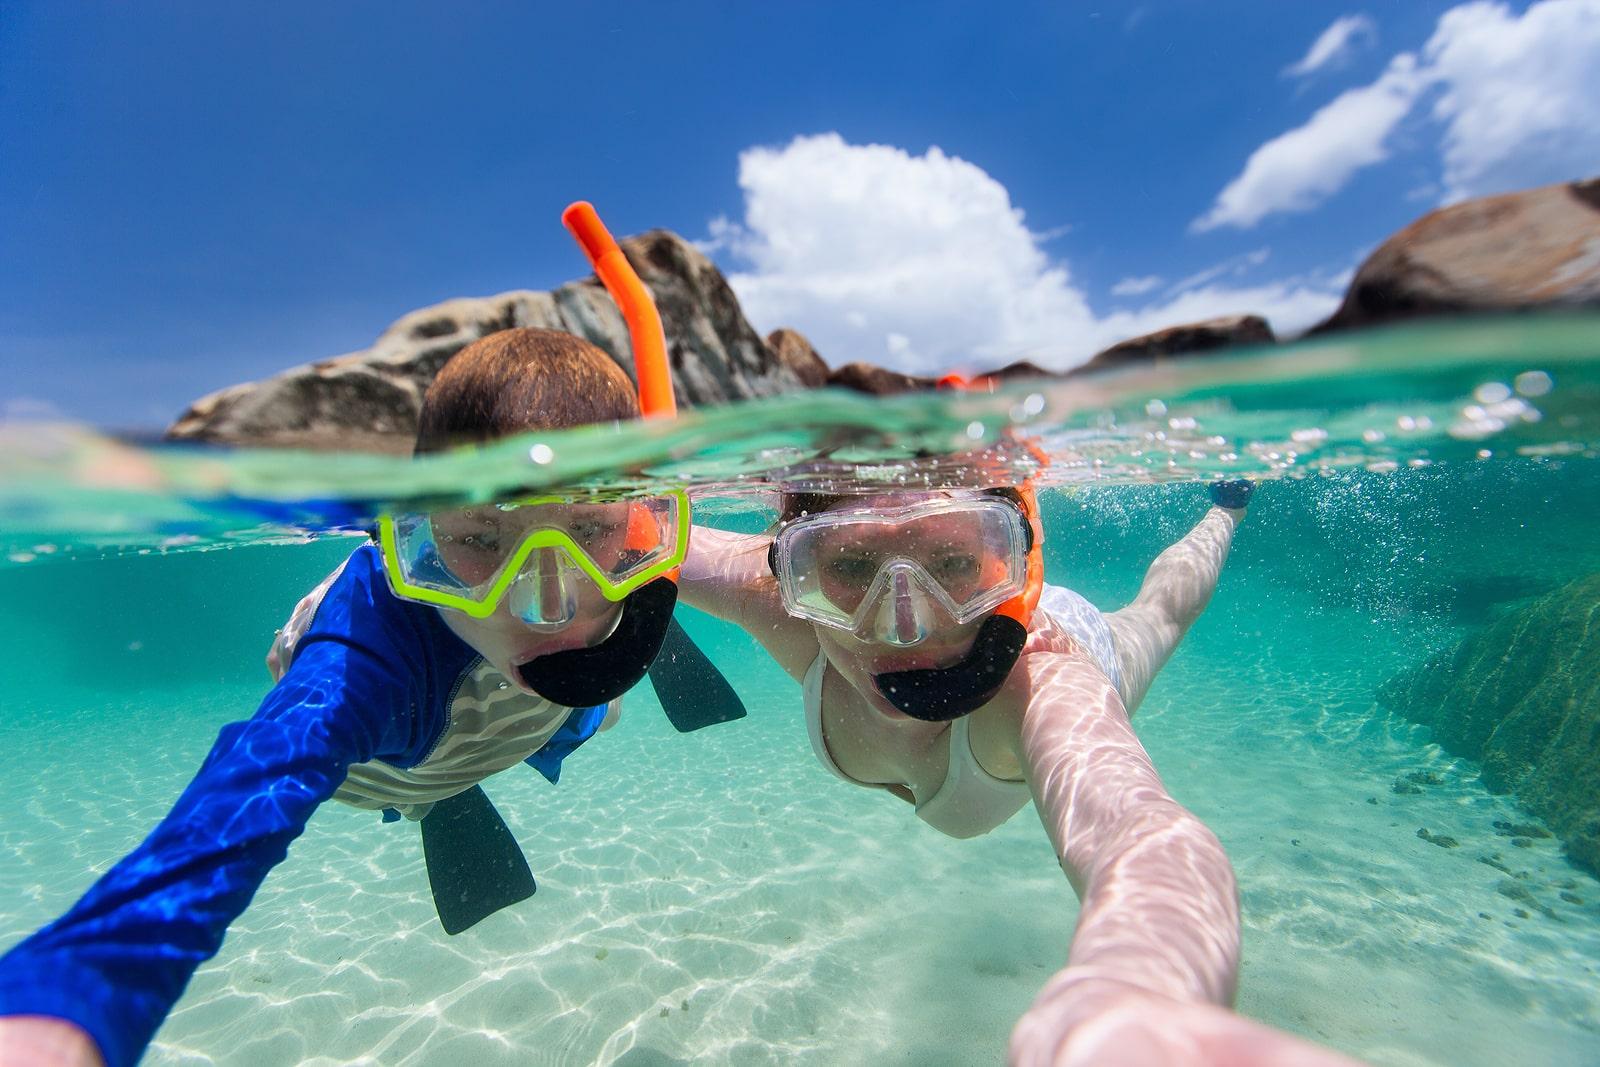 Krystal Cancun Timeshare Reviews a Snorkel Excursion at Belize Barrier Reef